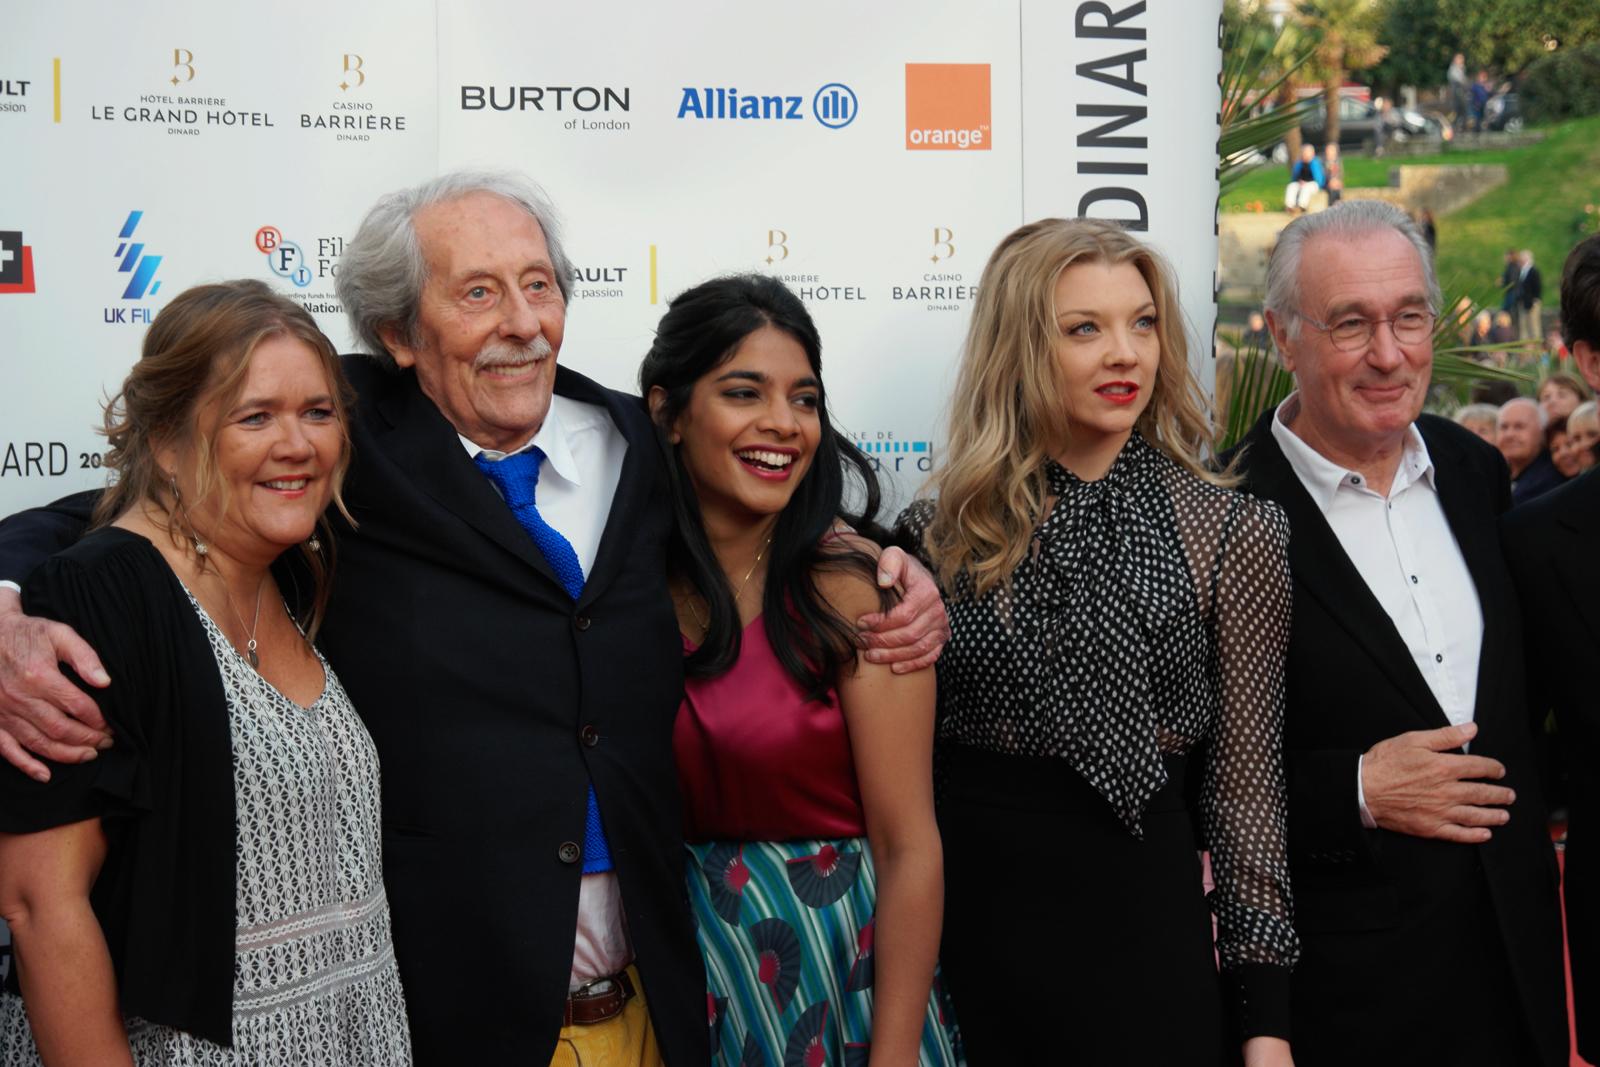 Jean Rochefort et son jury Amara Karan Natalie Dormer Bernard Lecoq festival du film de dinard 2015 tapis rouge photo by usofparis